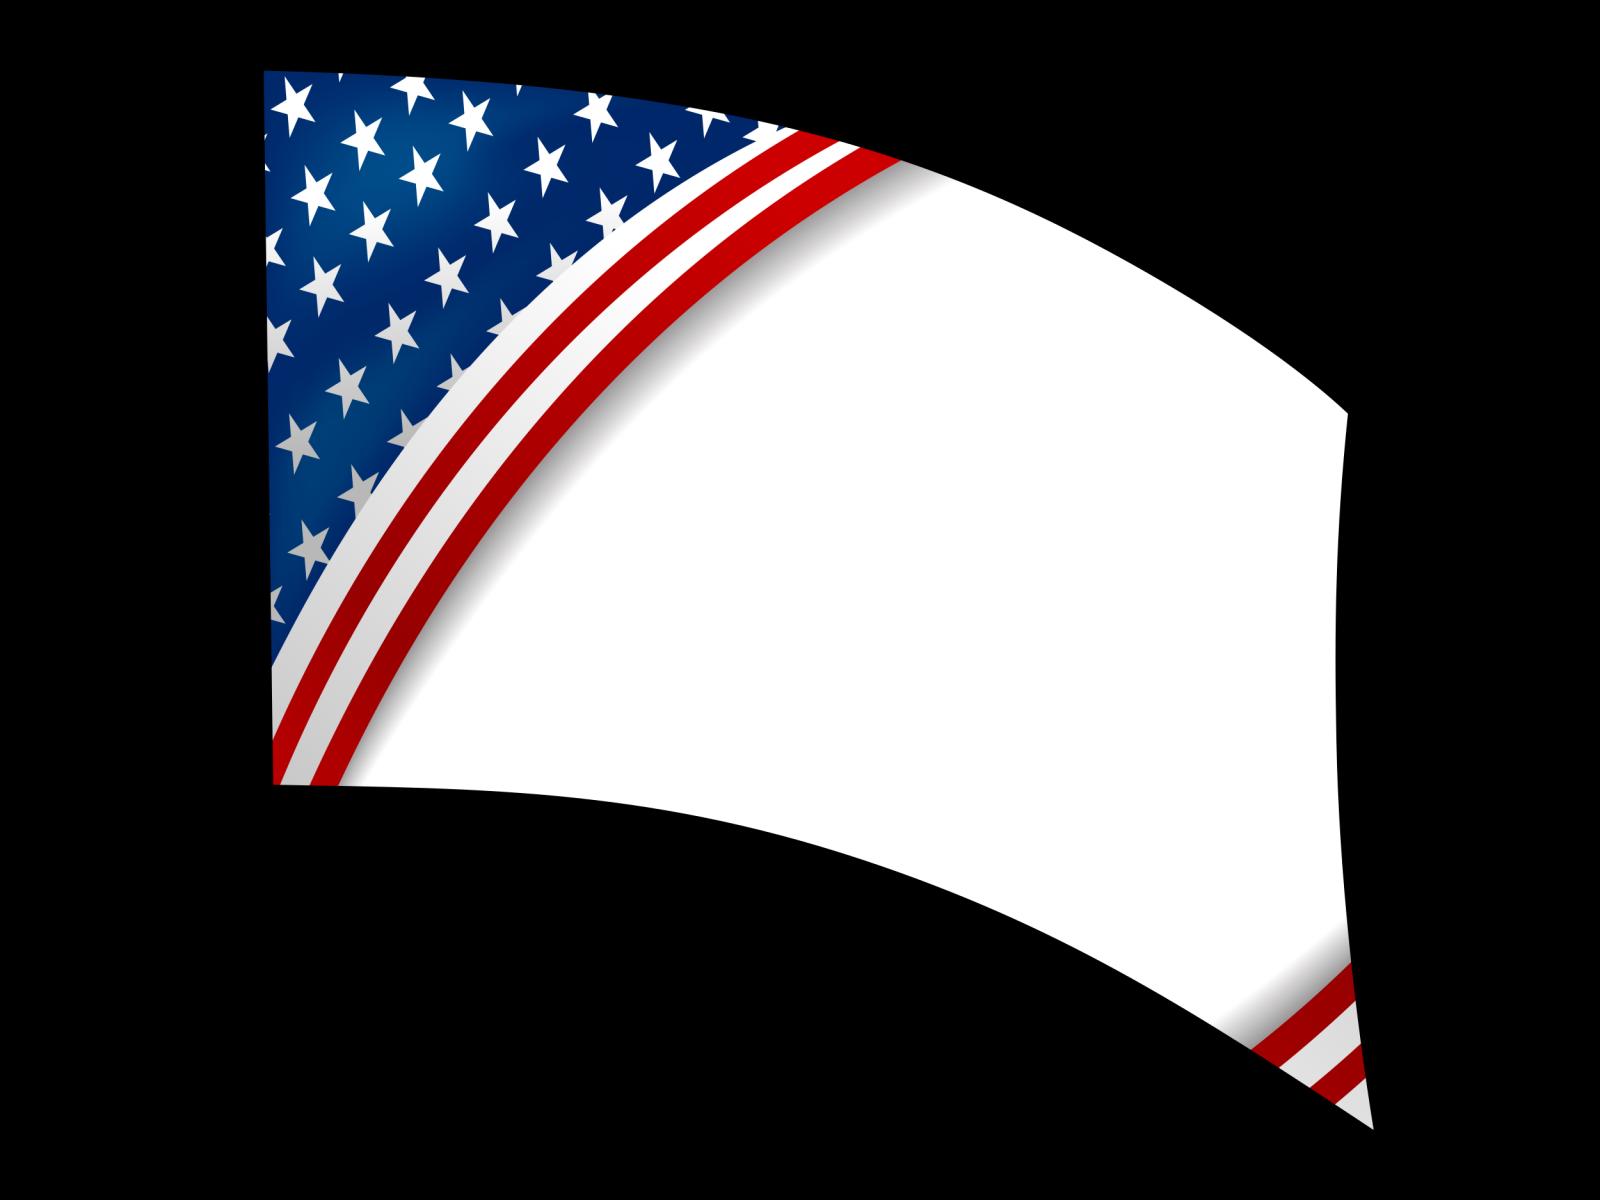 060220s - 36x52 Standard Patriotic 4